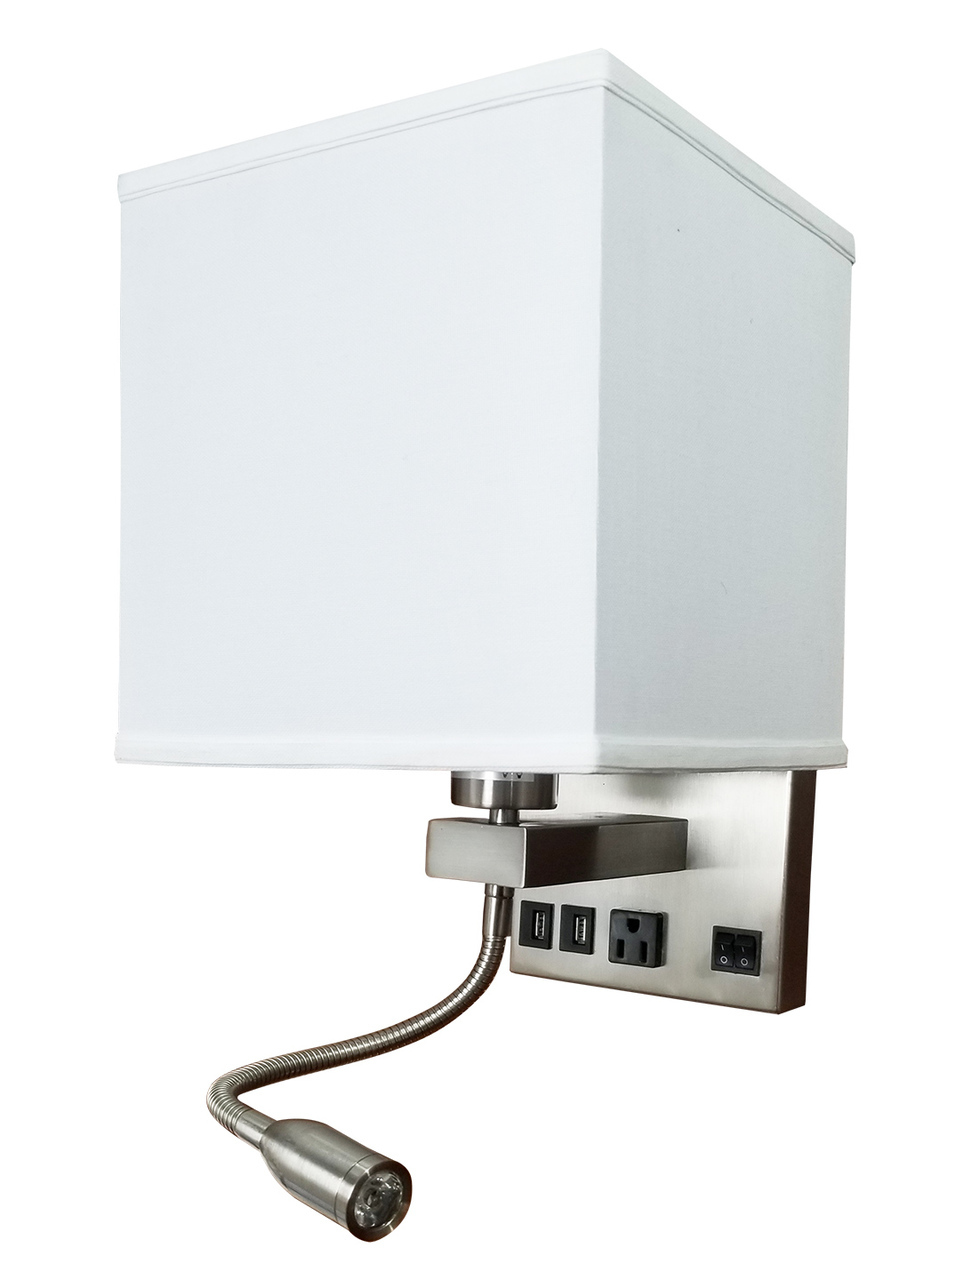 Led Wall Lamp Wl330 3w Adjustable Arm 2 Usb Ports 1 Standard Plug Outlet